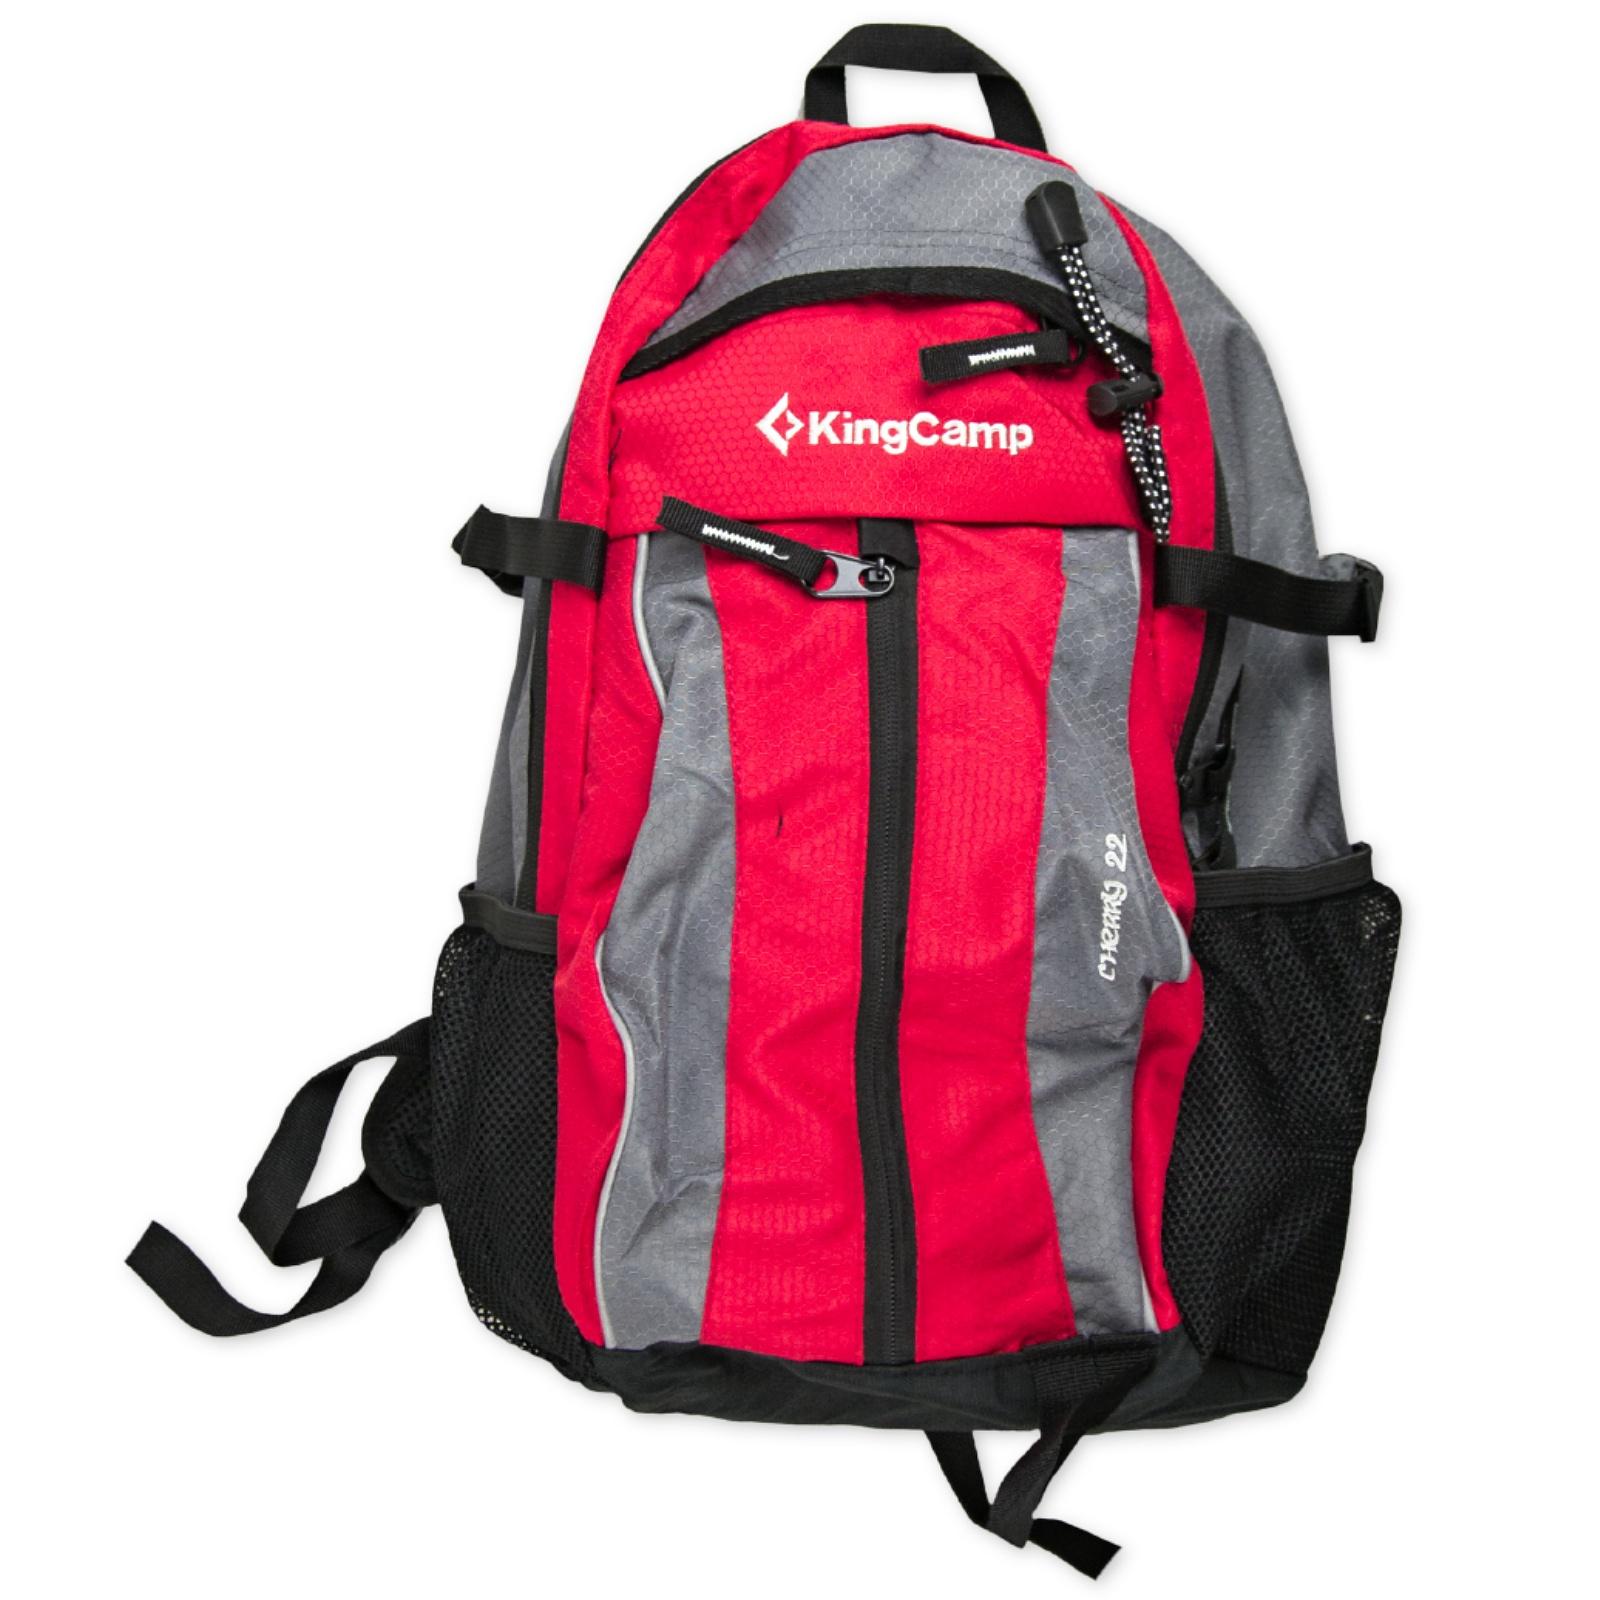 7143c3d6077c3 Plecak King Camp Cherry 22 - red